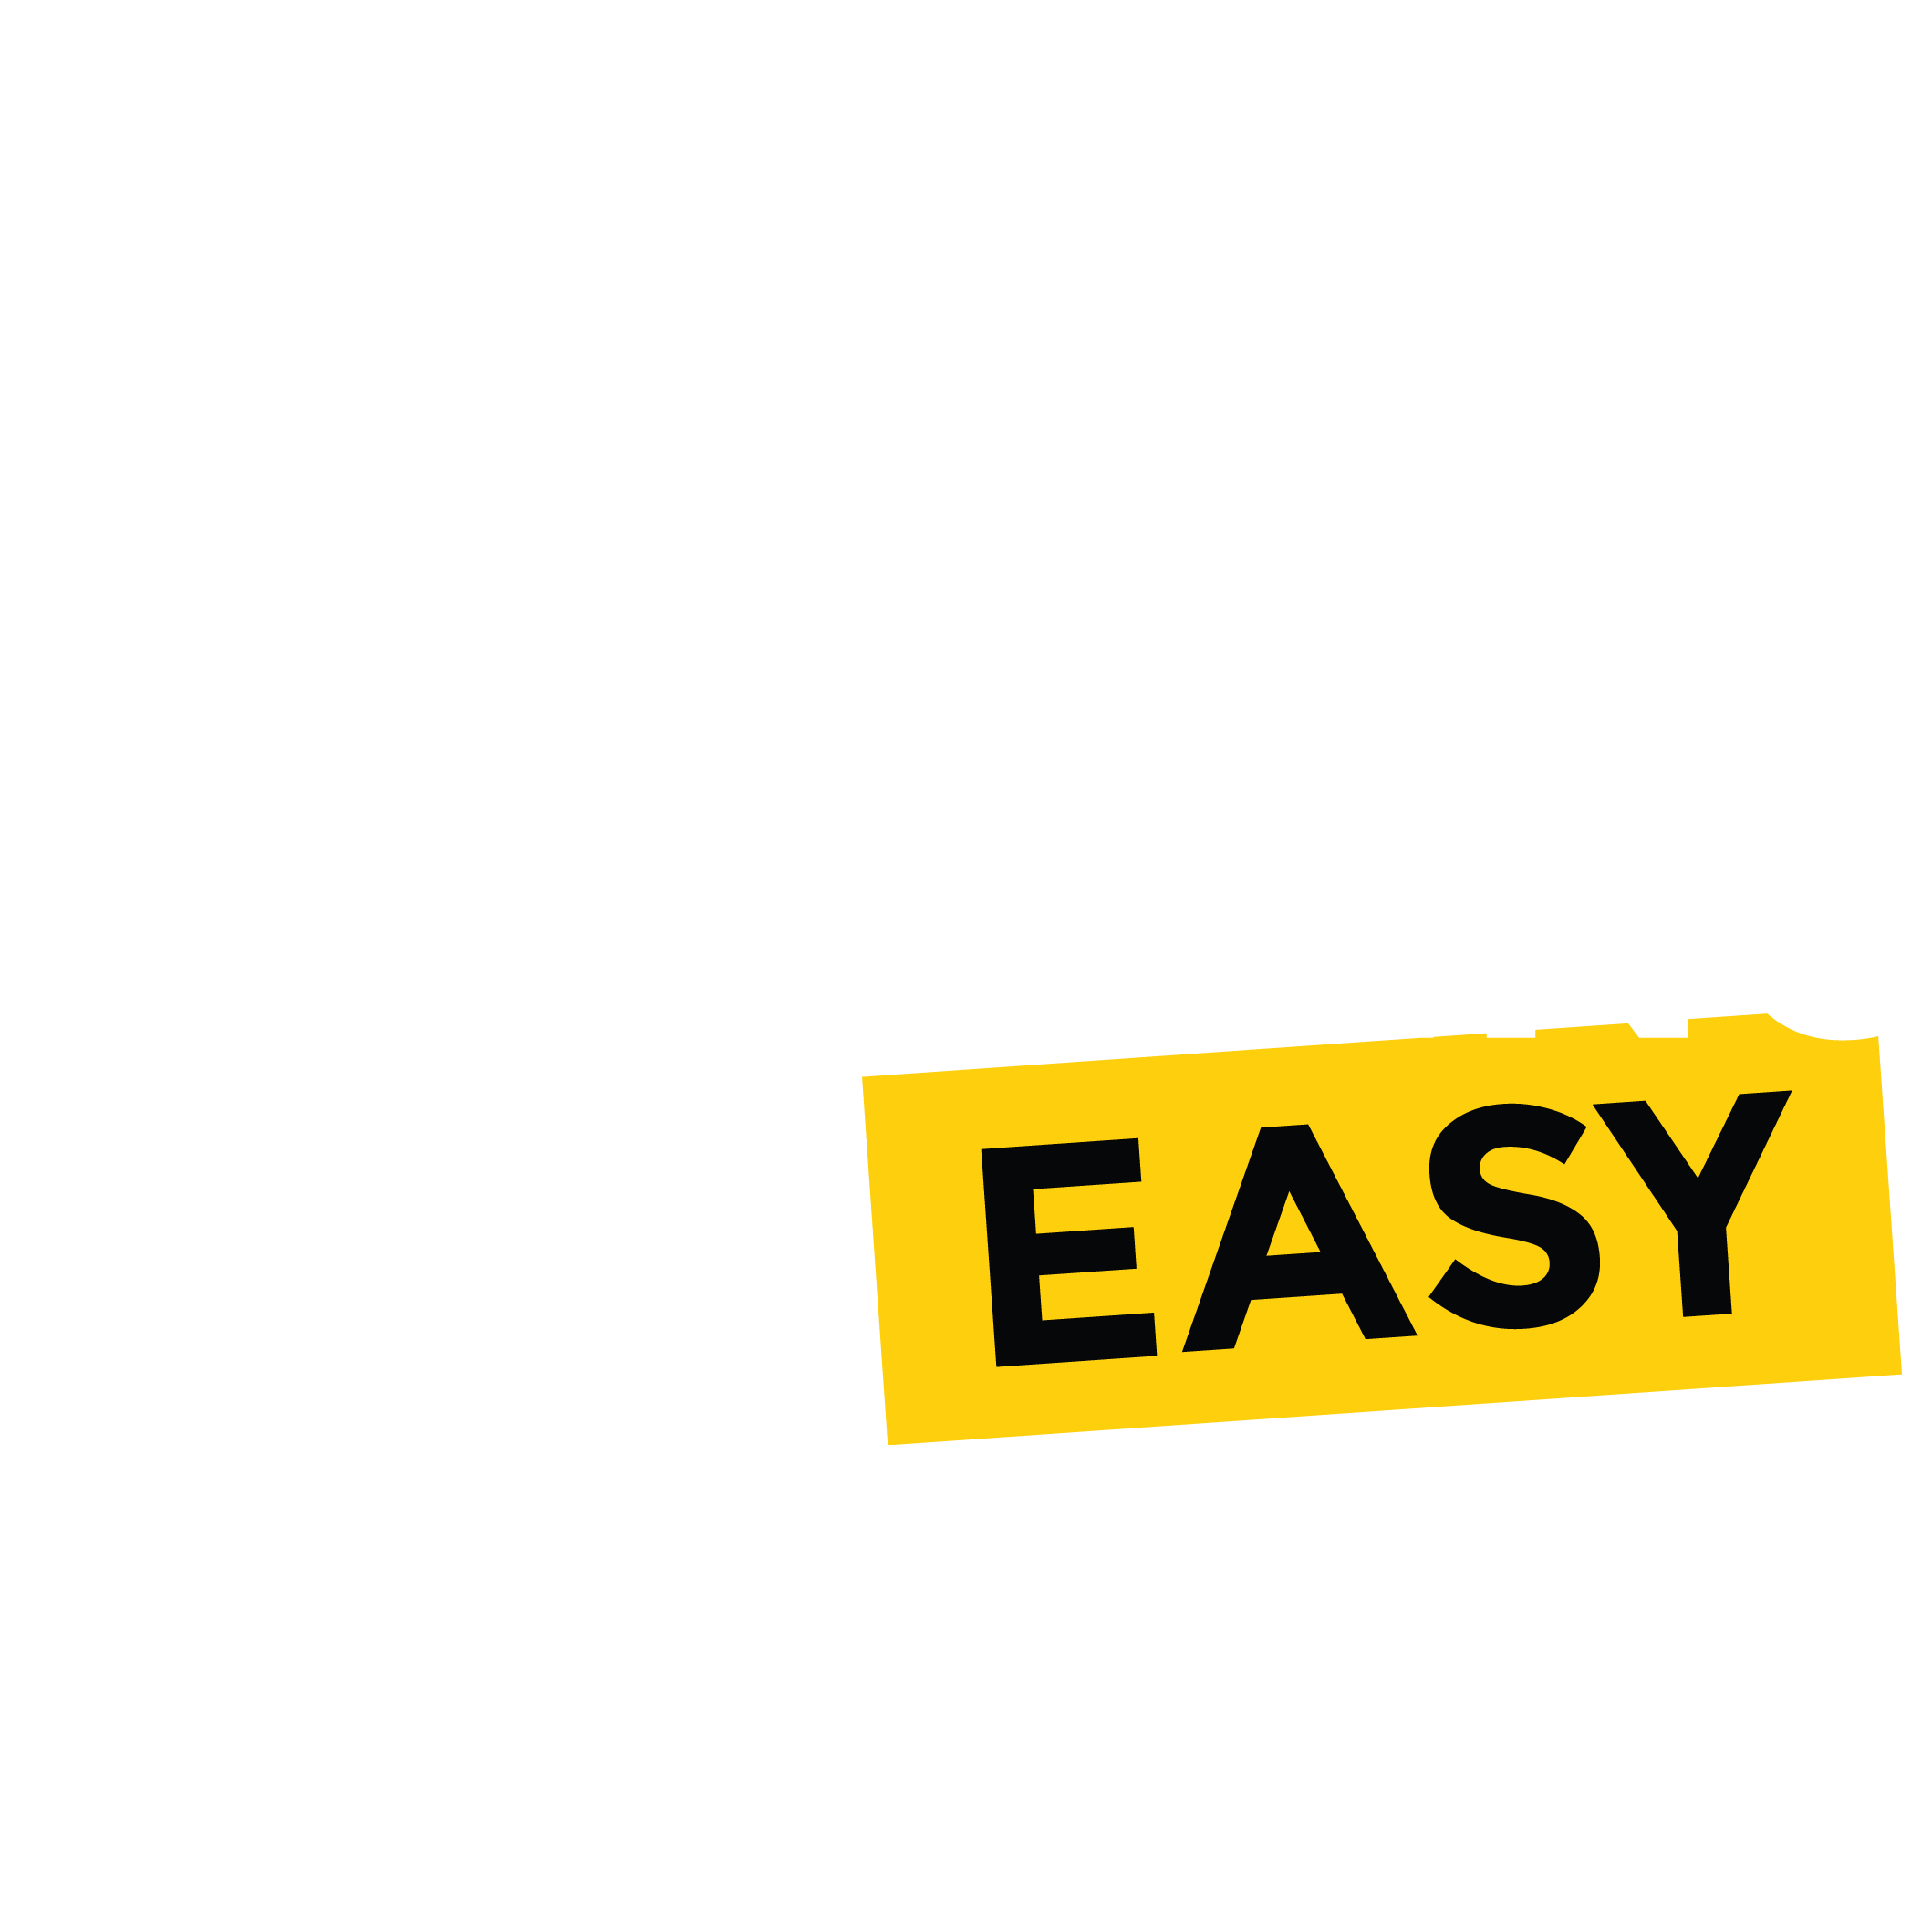 online-marketing-logo-white.png